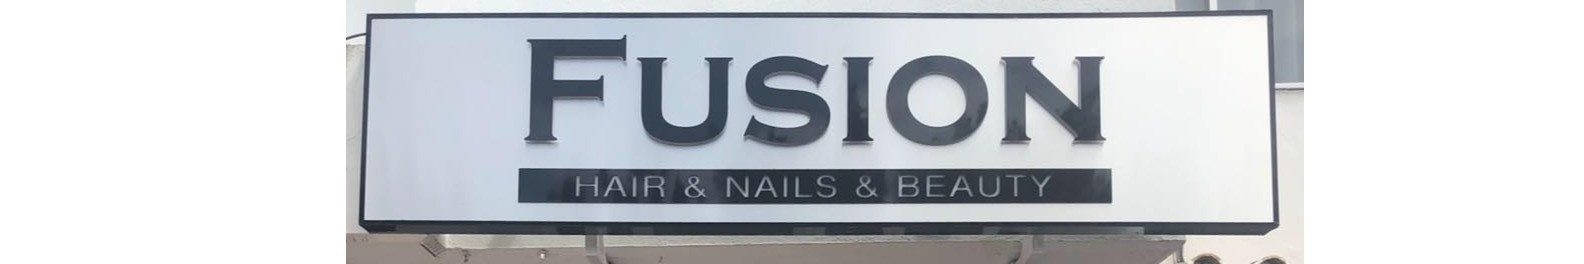 Fusion Hair, Nails & Beauty Elviria